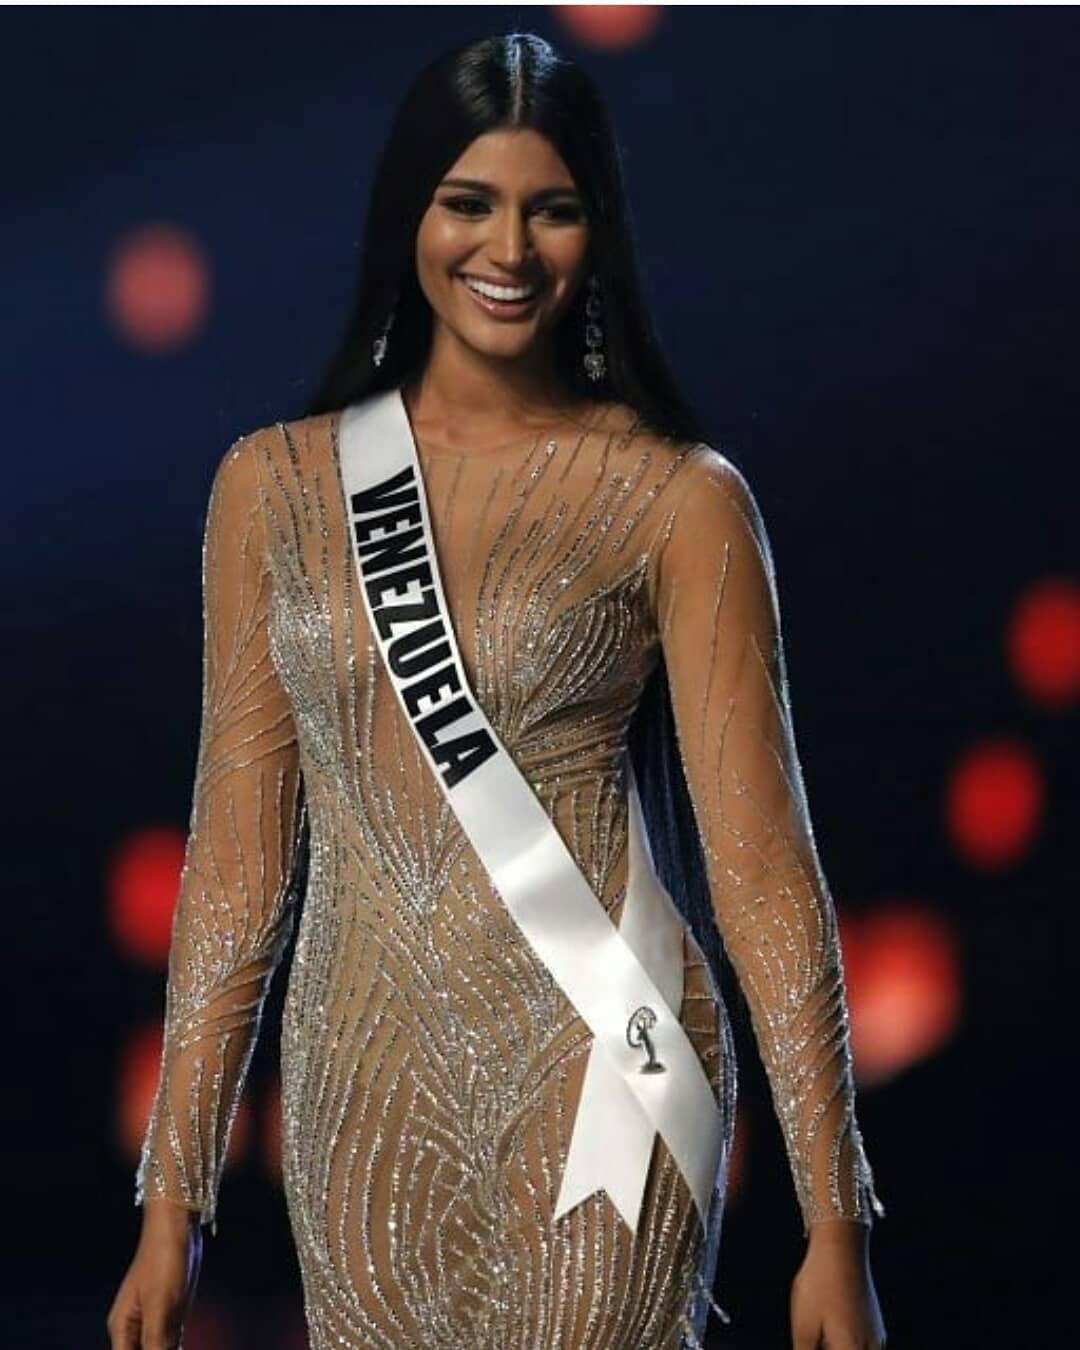 sthefany gutierrez, top 3 de miss universe 2018. - Página 23 Ppewoj10